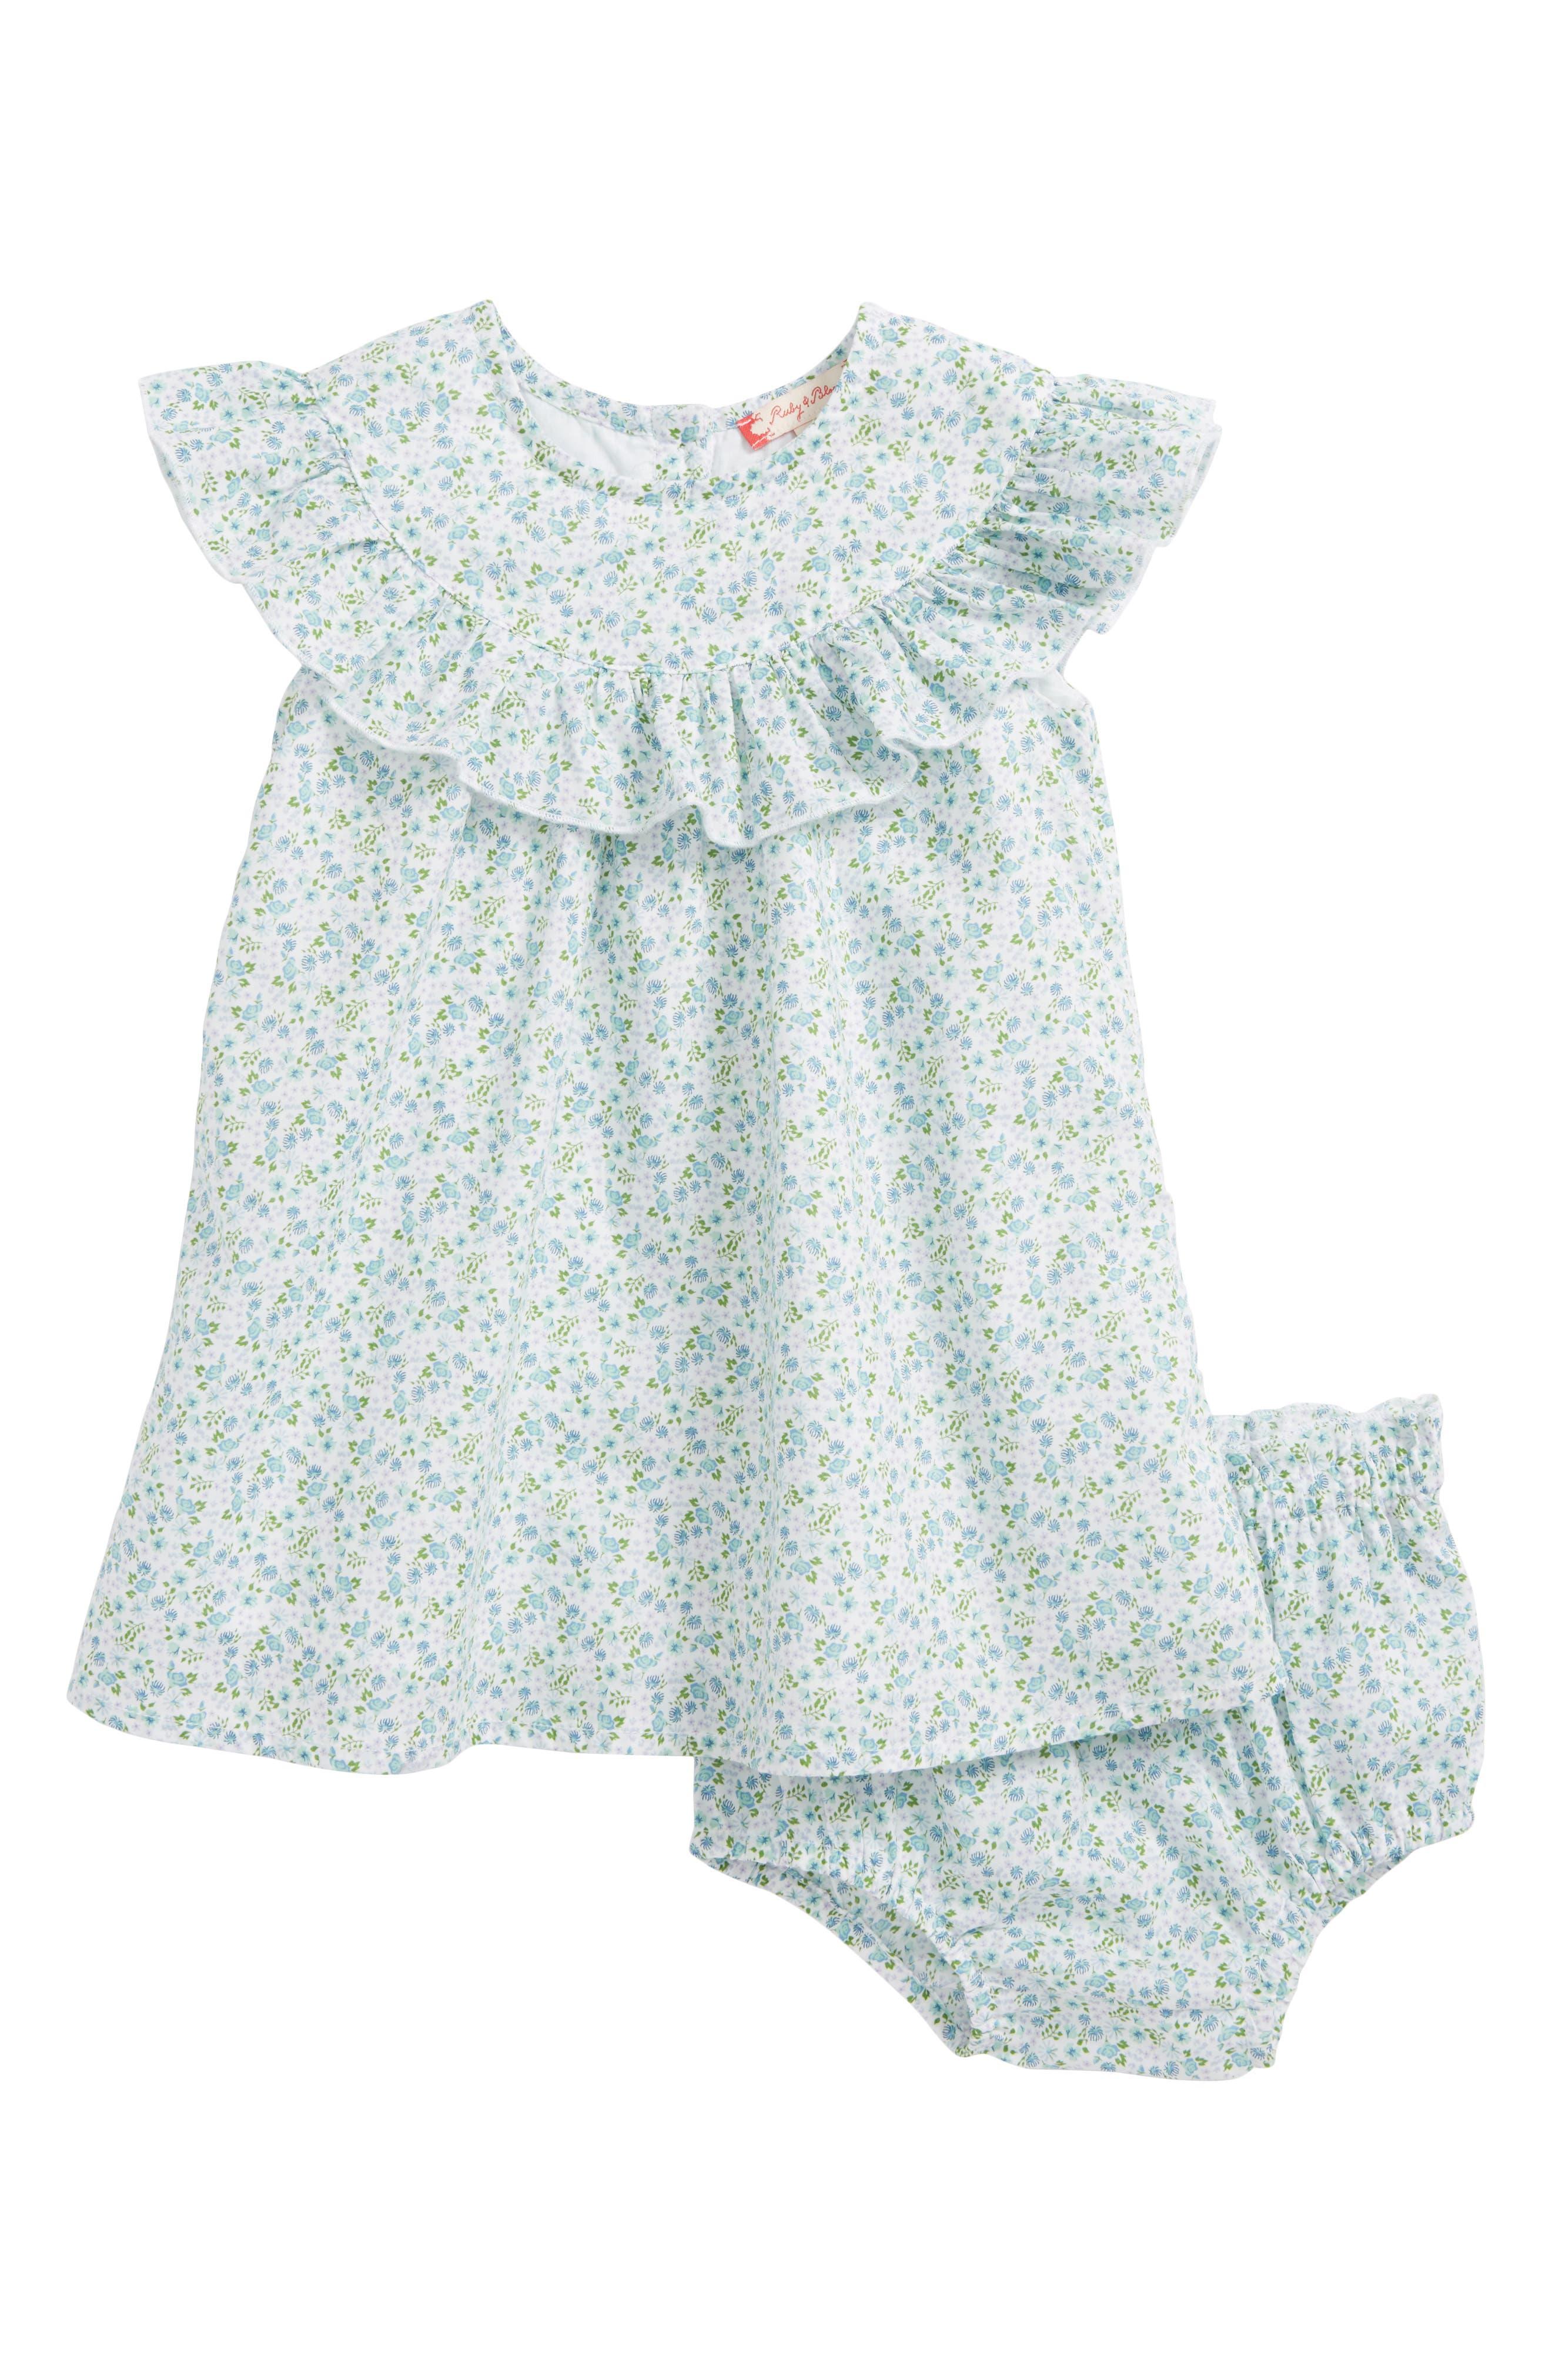 Ruffle Dress,                             Main thumbnail 1, color,                             White- Blue Tropic Ditsy